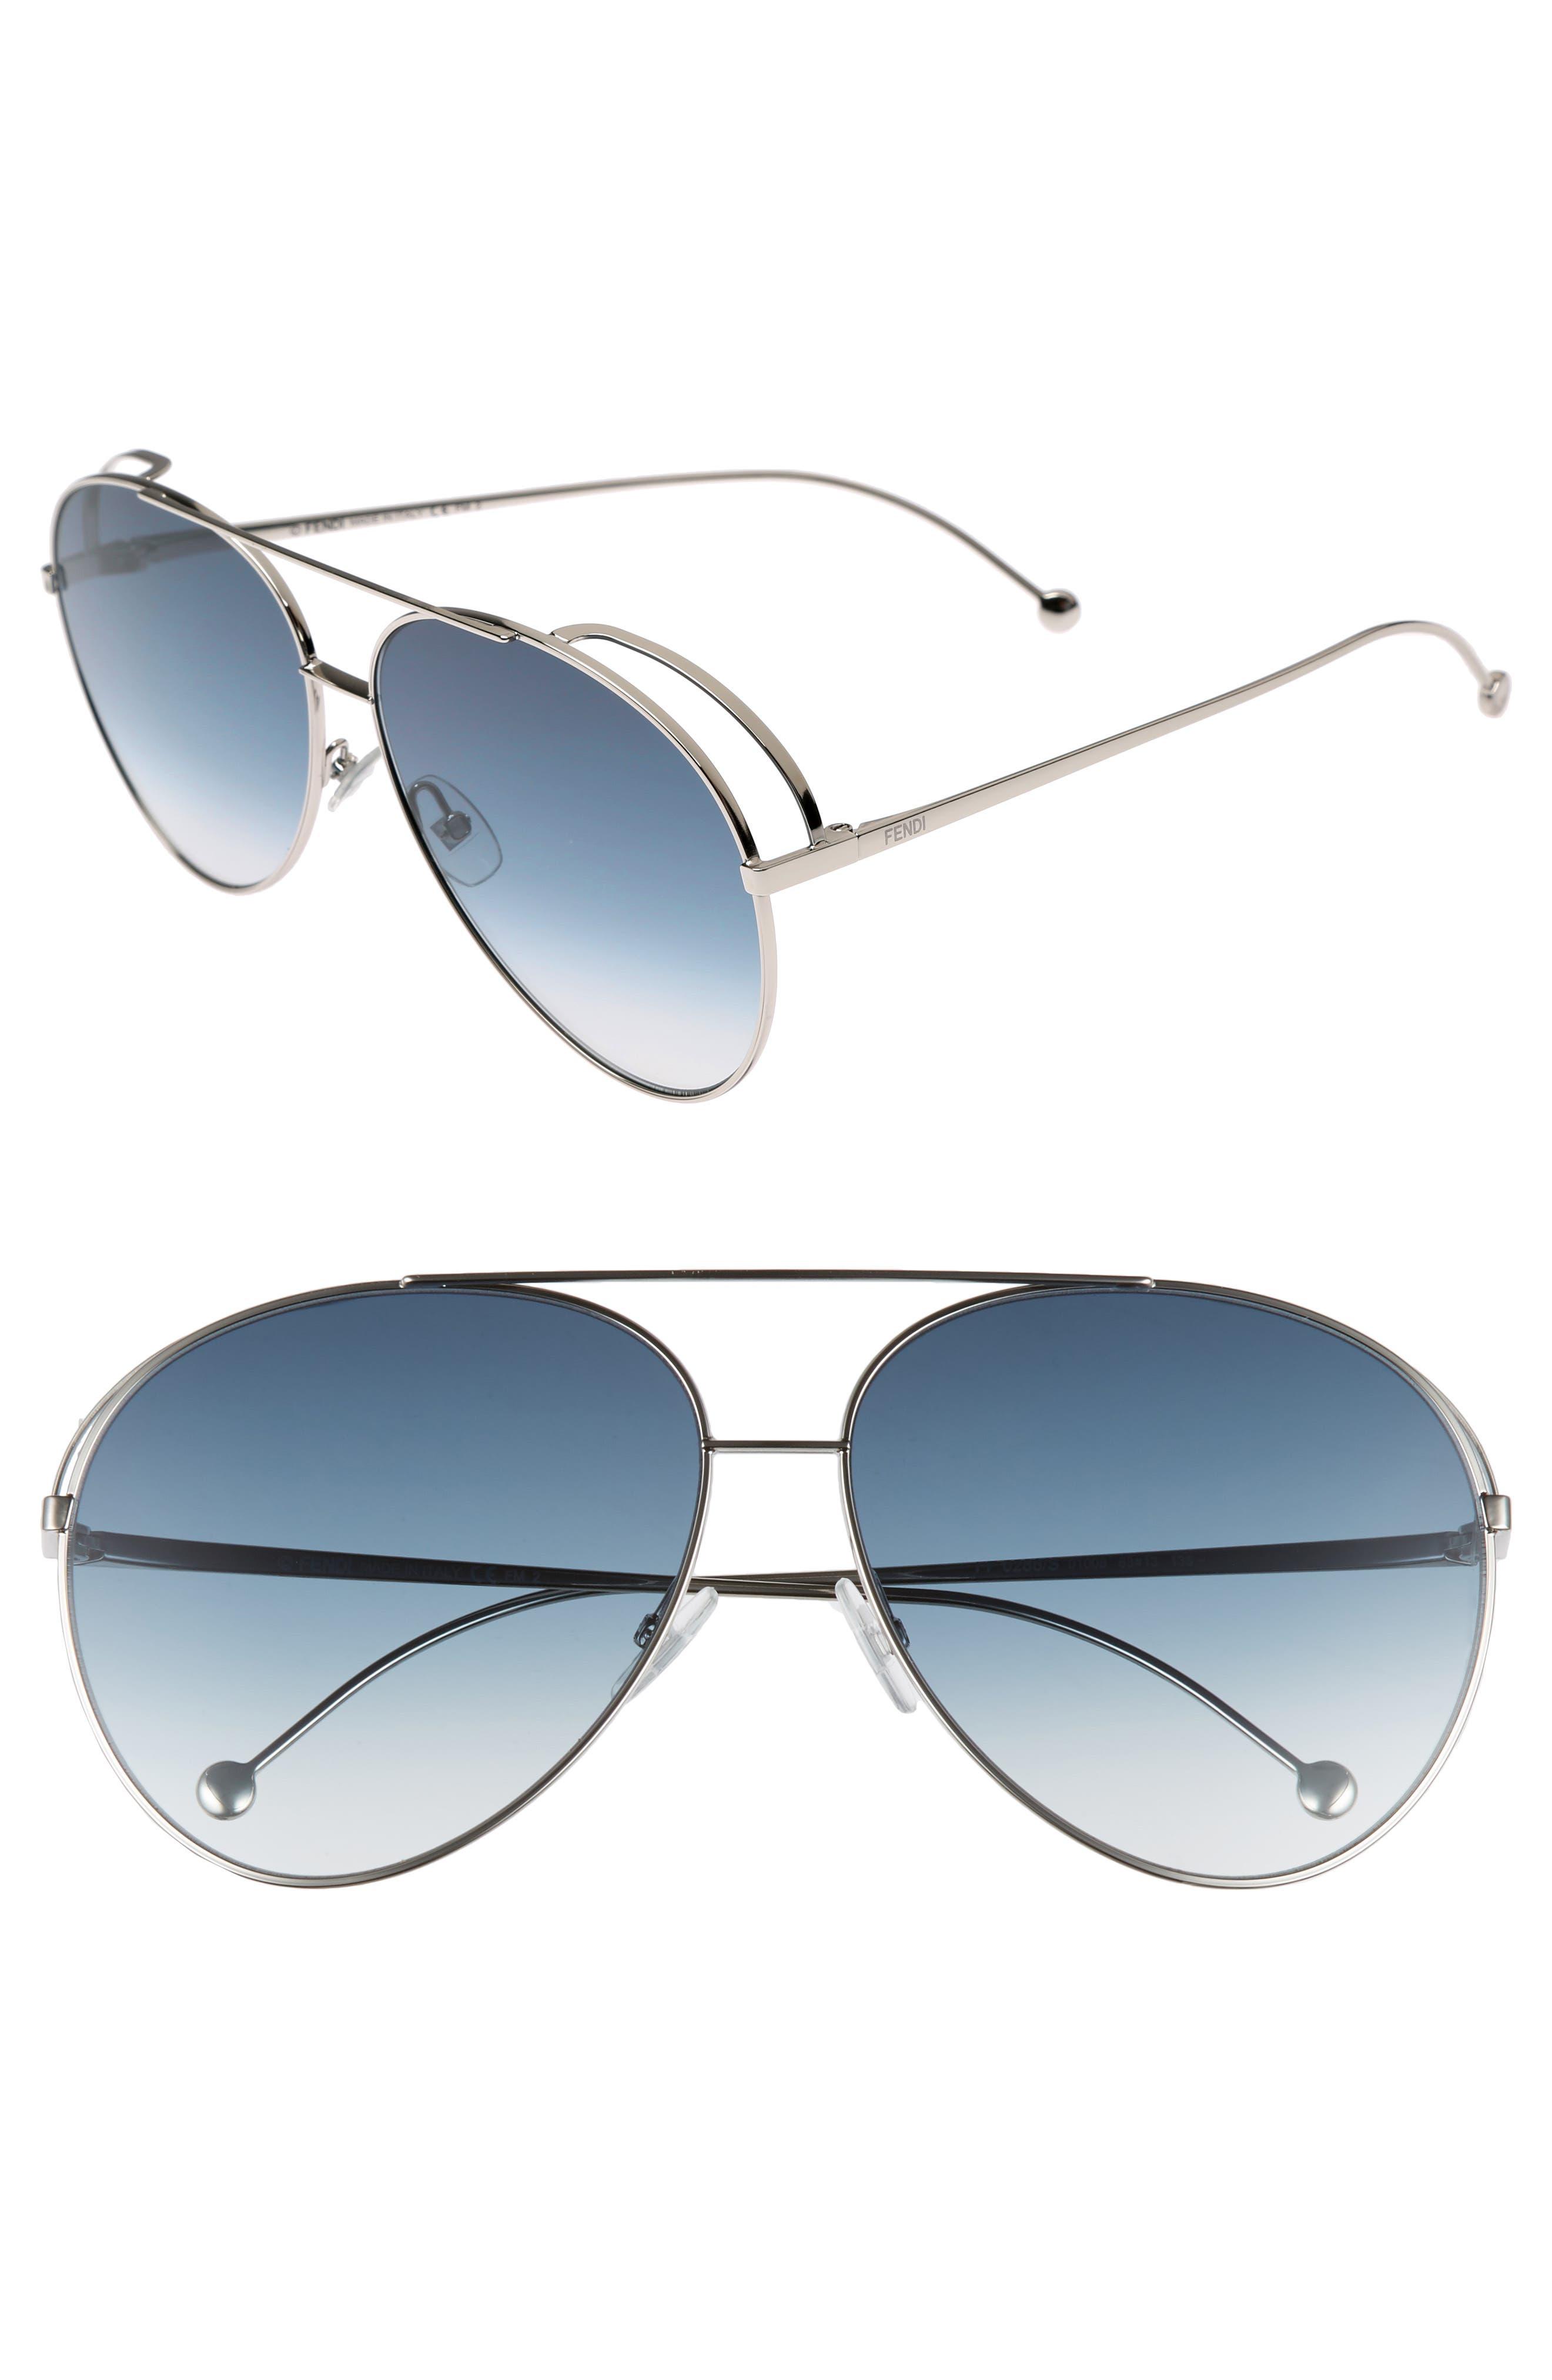 52mm Aviator Sunglasses,                         Main,                         color, PALLADIUM